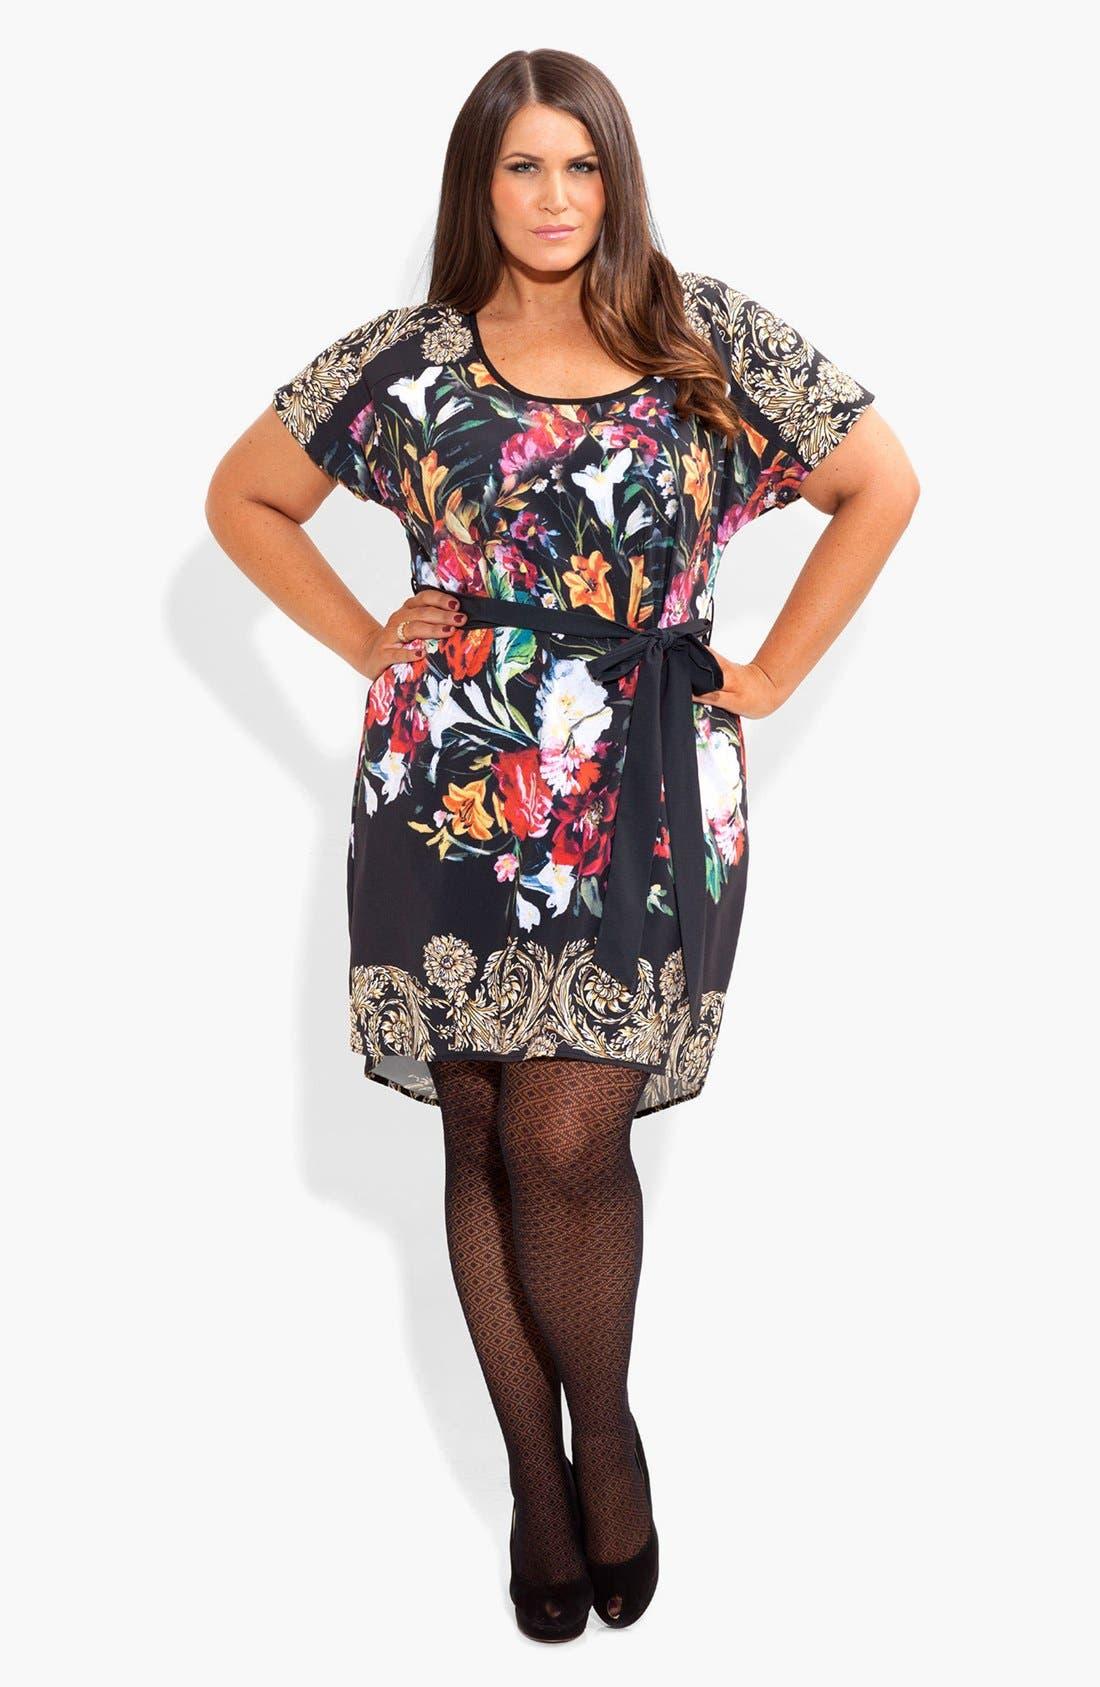 Alternate Image 1 Selected - City Chic 'Still Life' Print Tunic Dress (Plus Size)